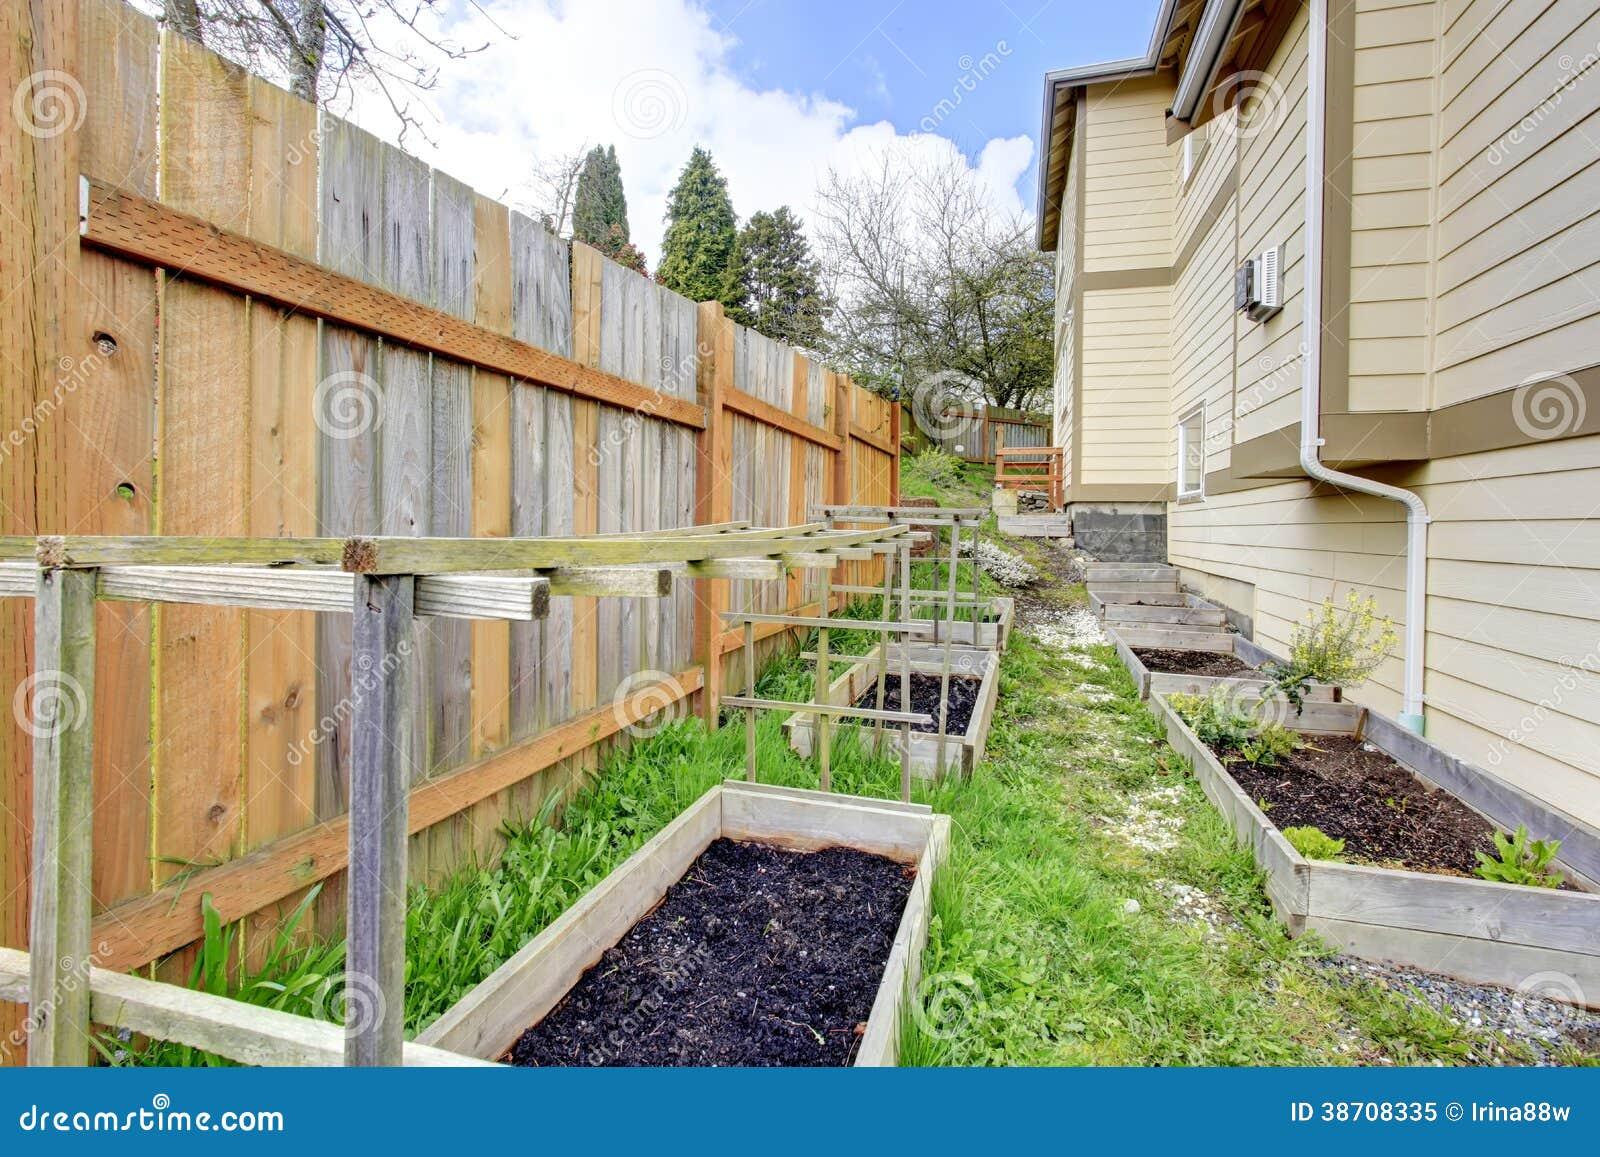 trelica jardim madeira:Small Wooden Garden Trellis